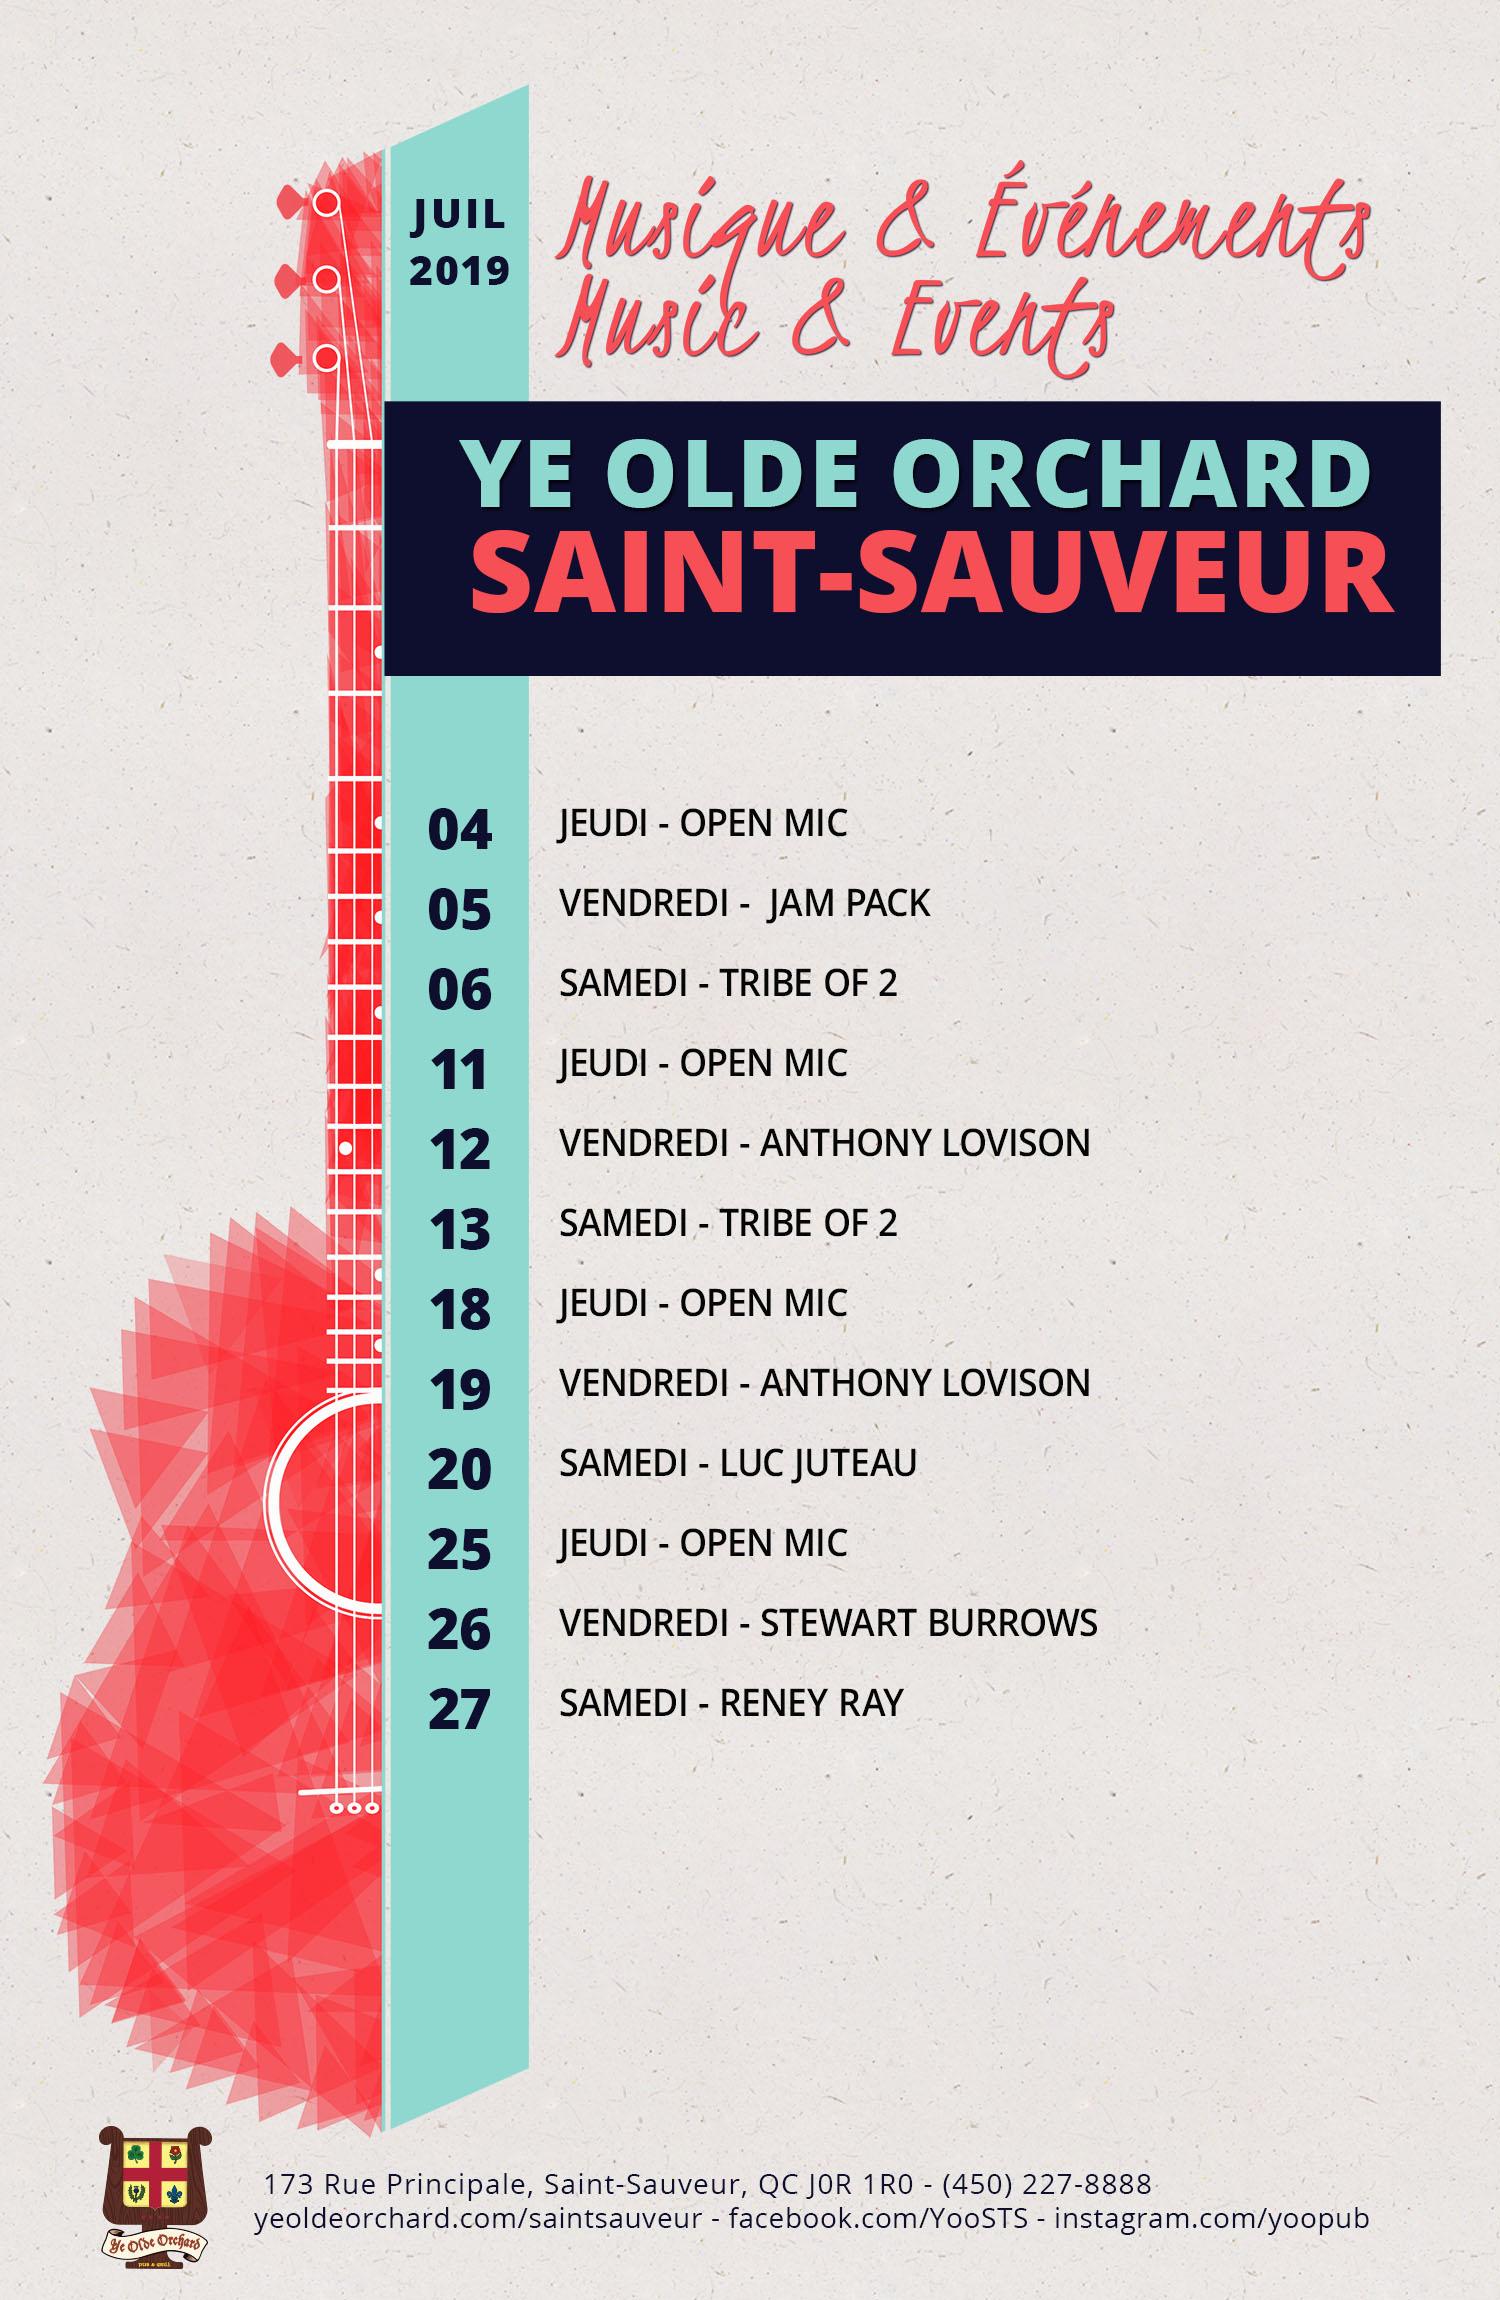 ye-olde-orchard-pub-music-and-events-calendar-SaintSauveur-OG